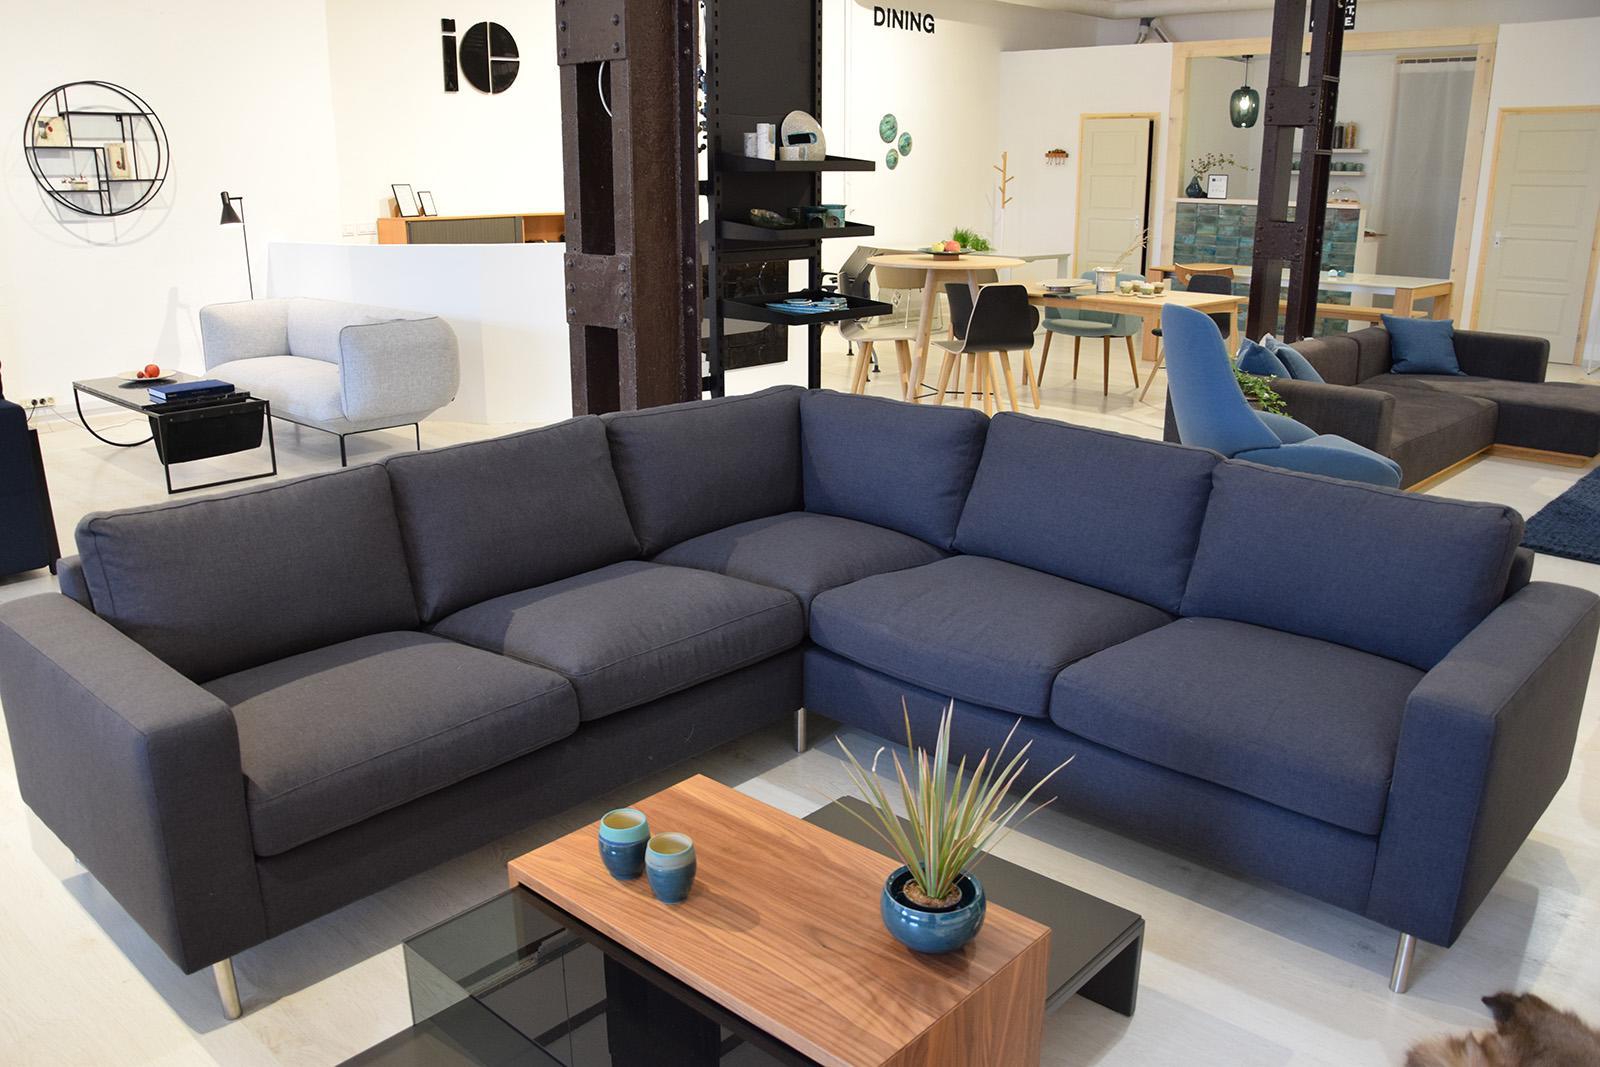 SCANDINAVIA 5 Seater corner sofa - Showroom furniture